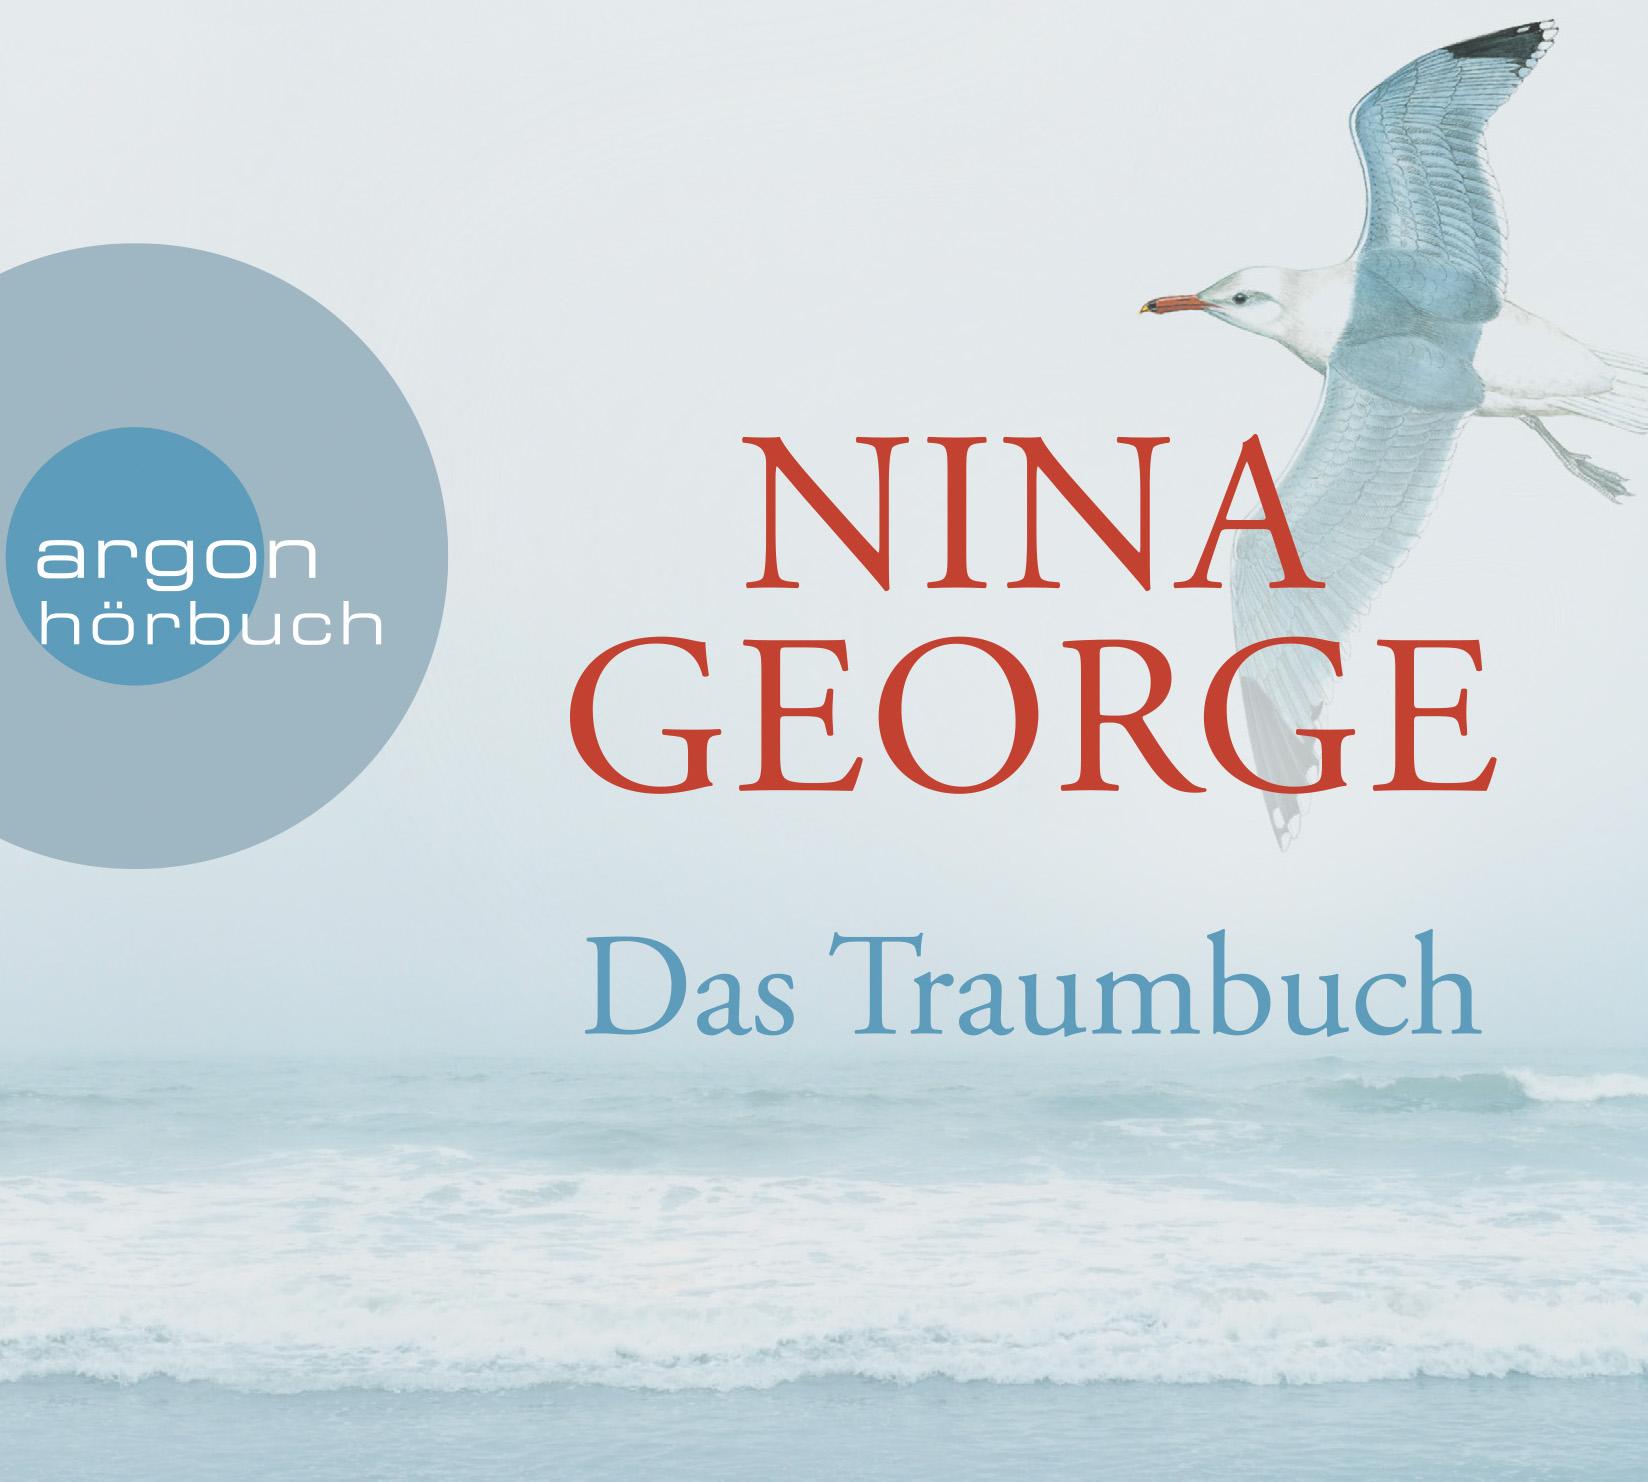 george-nina_das-traumbuch_hoerbuch